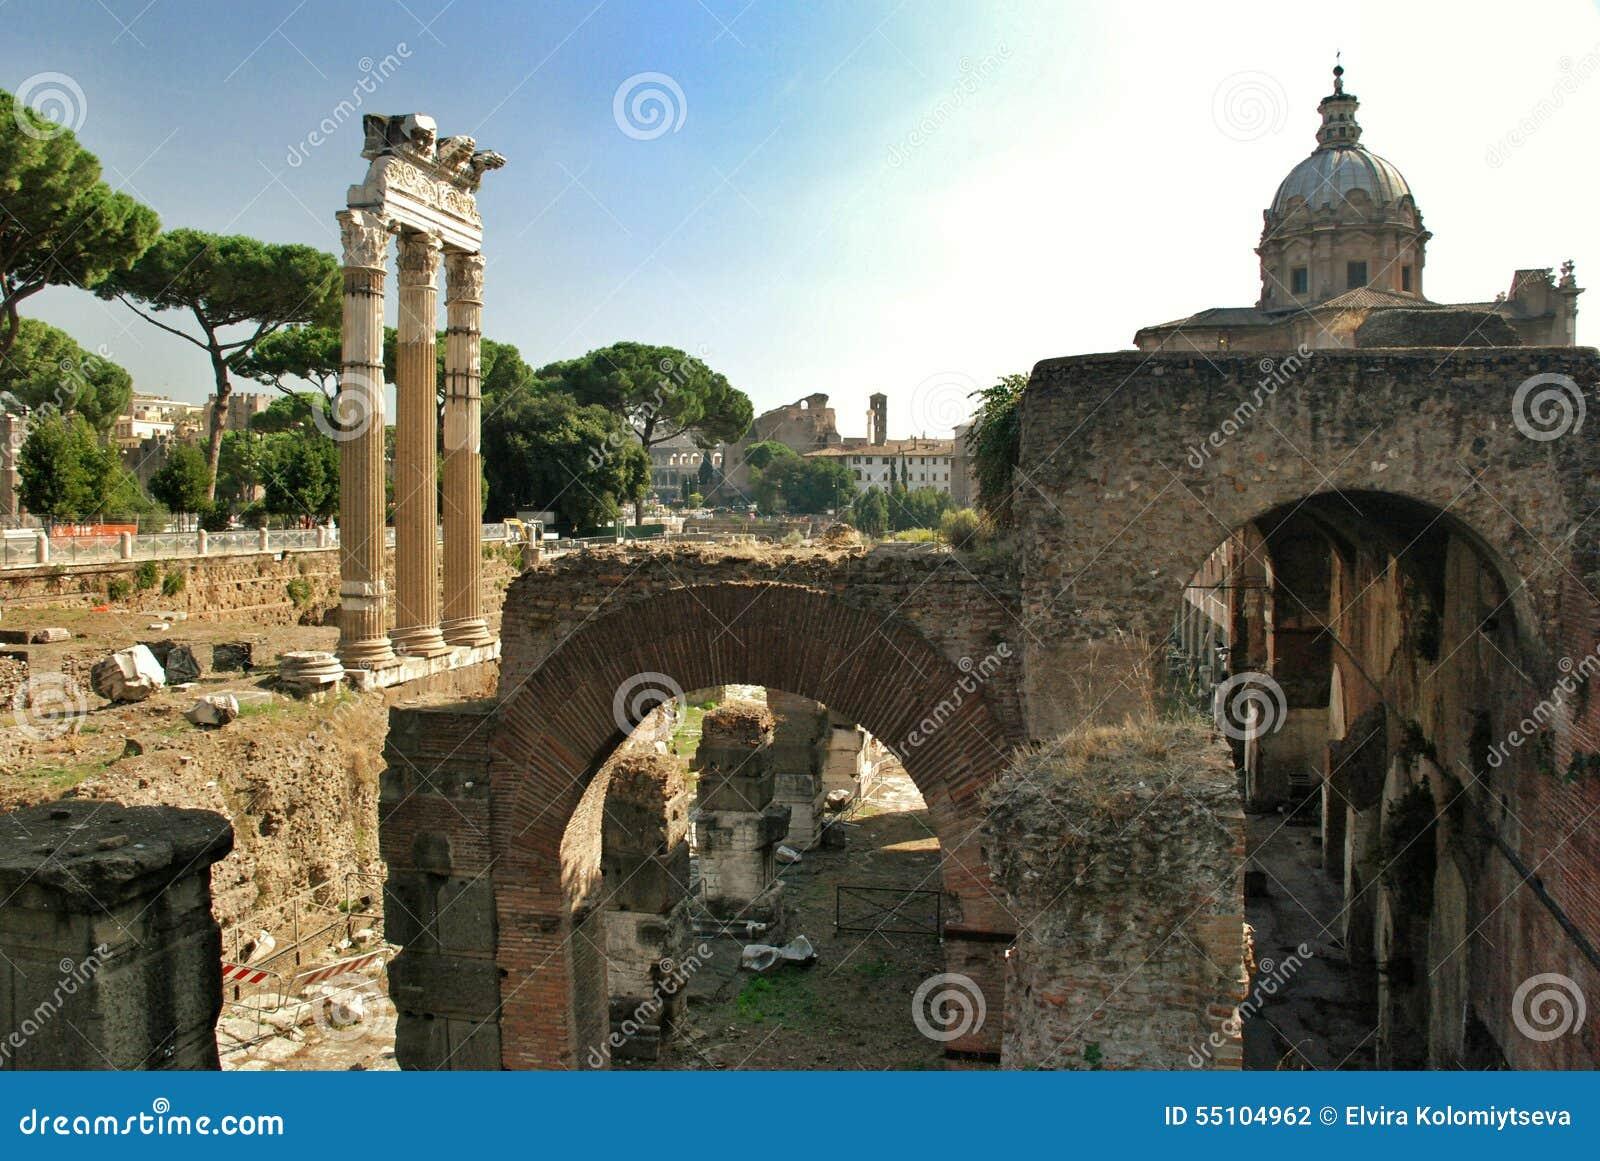 Rome, Palatine  Circus Maximus Editorial Photography - Image of